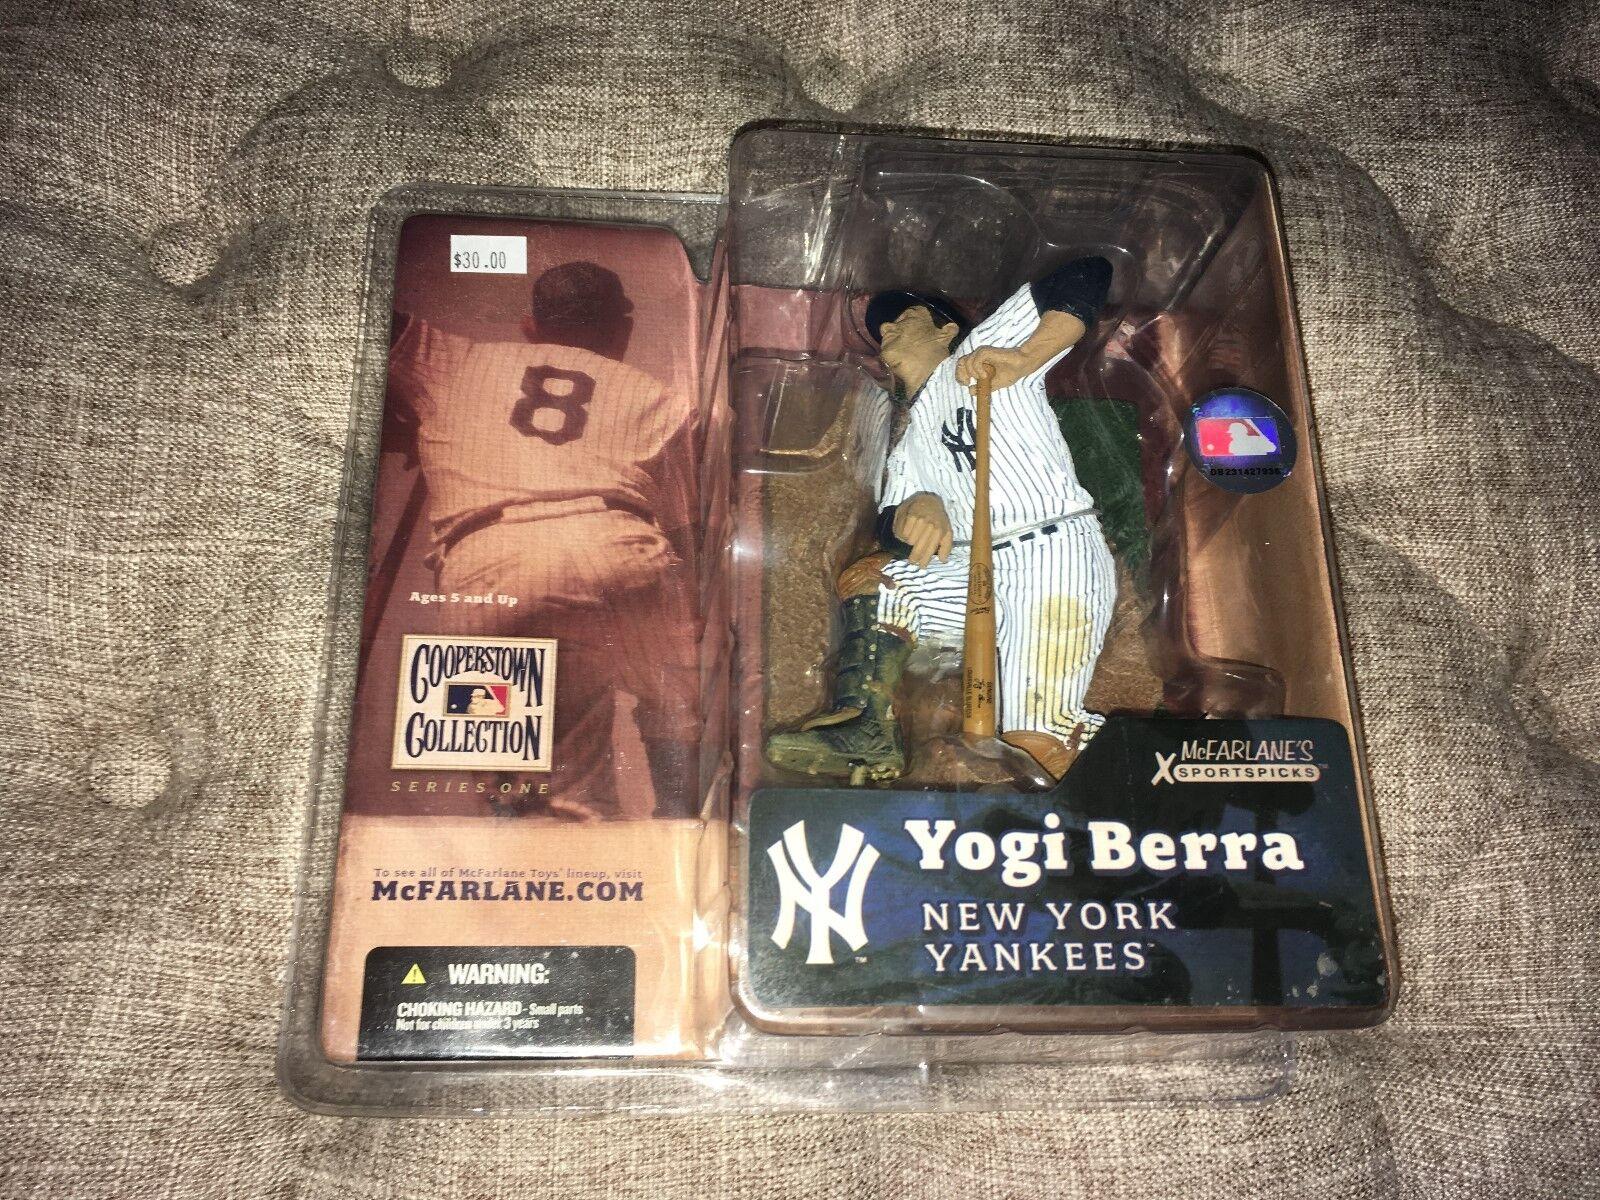 Yogi Berra New York Yankees Cooperstown Collection  McFarlane Toys Figure MIP